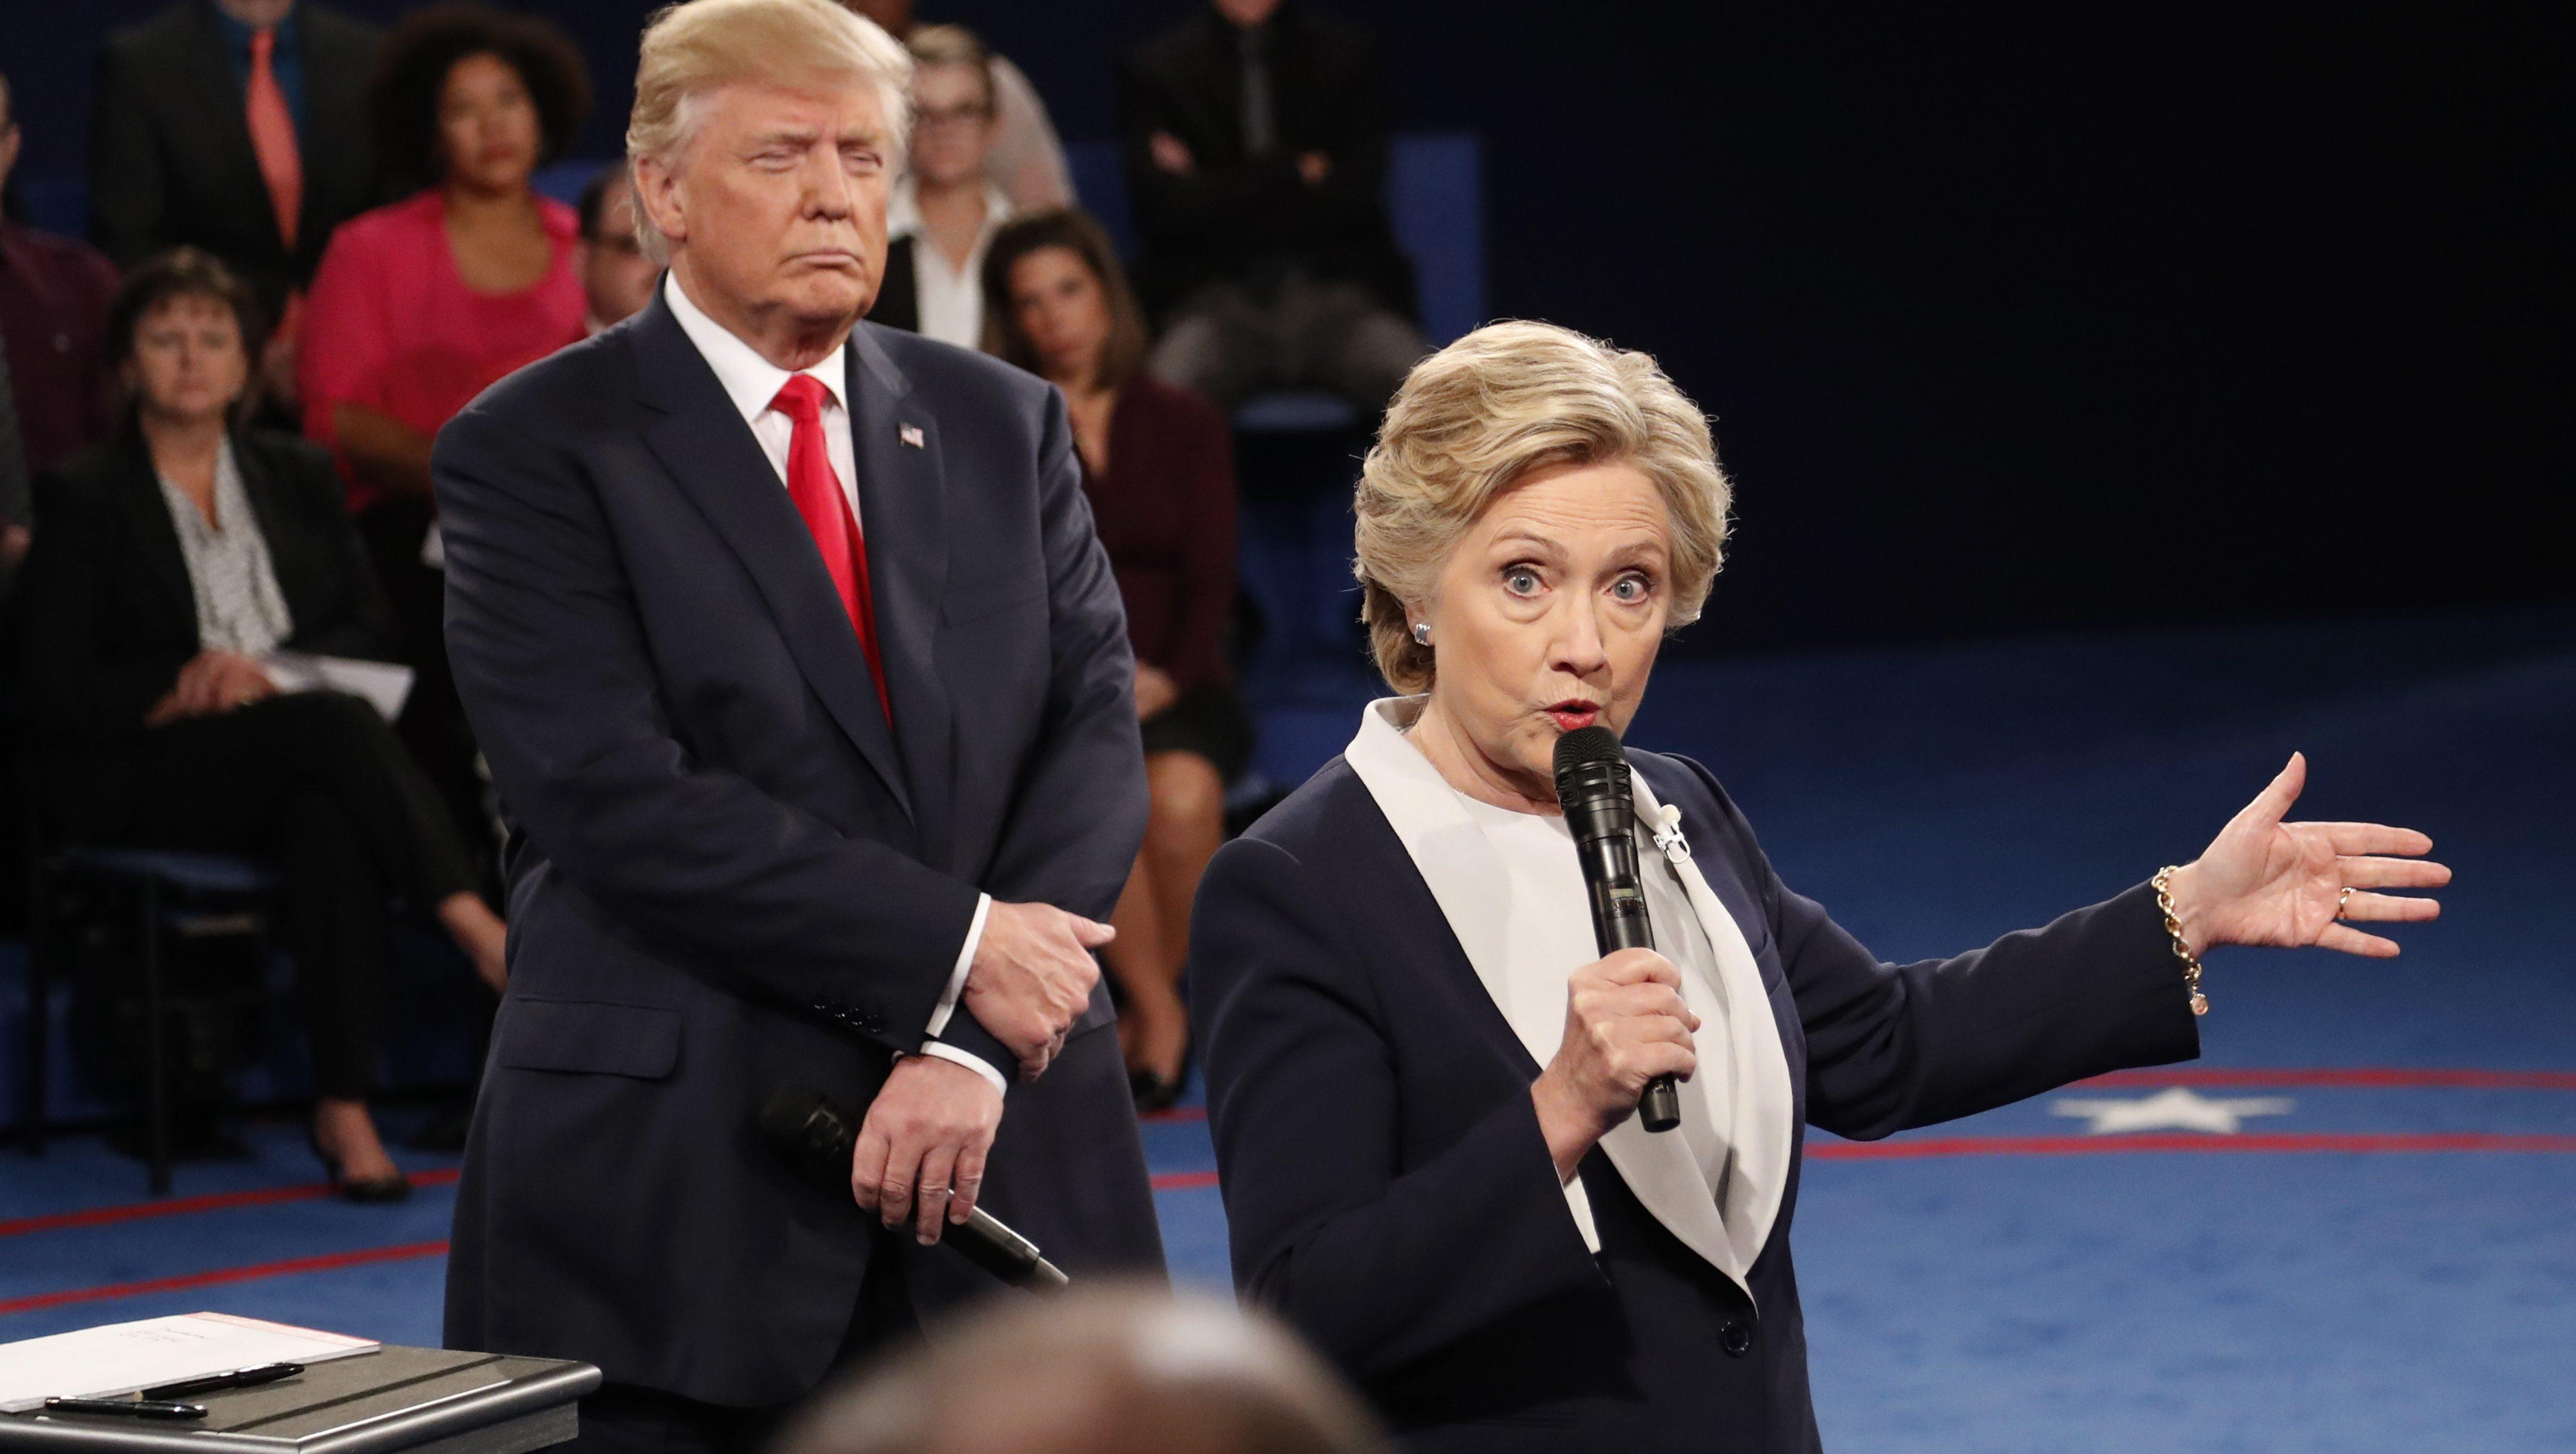 Hillary Clinton, Donald Trump presidential debate